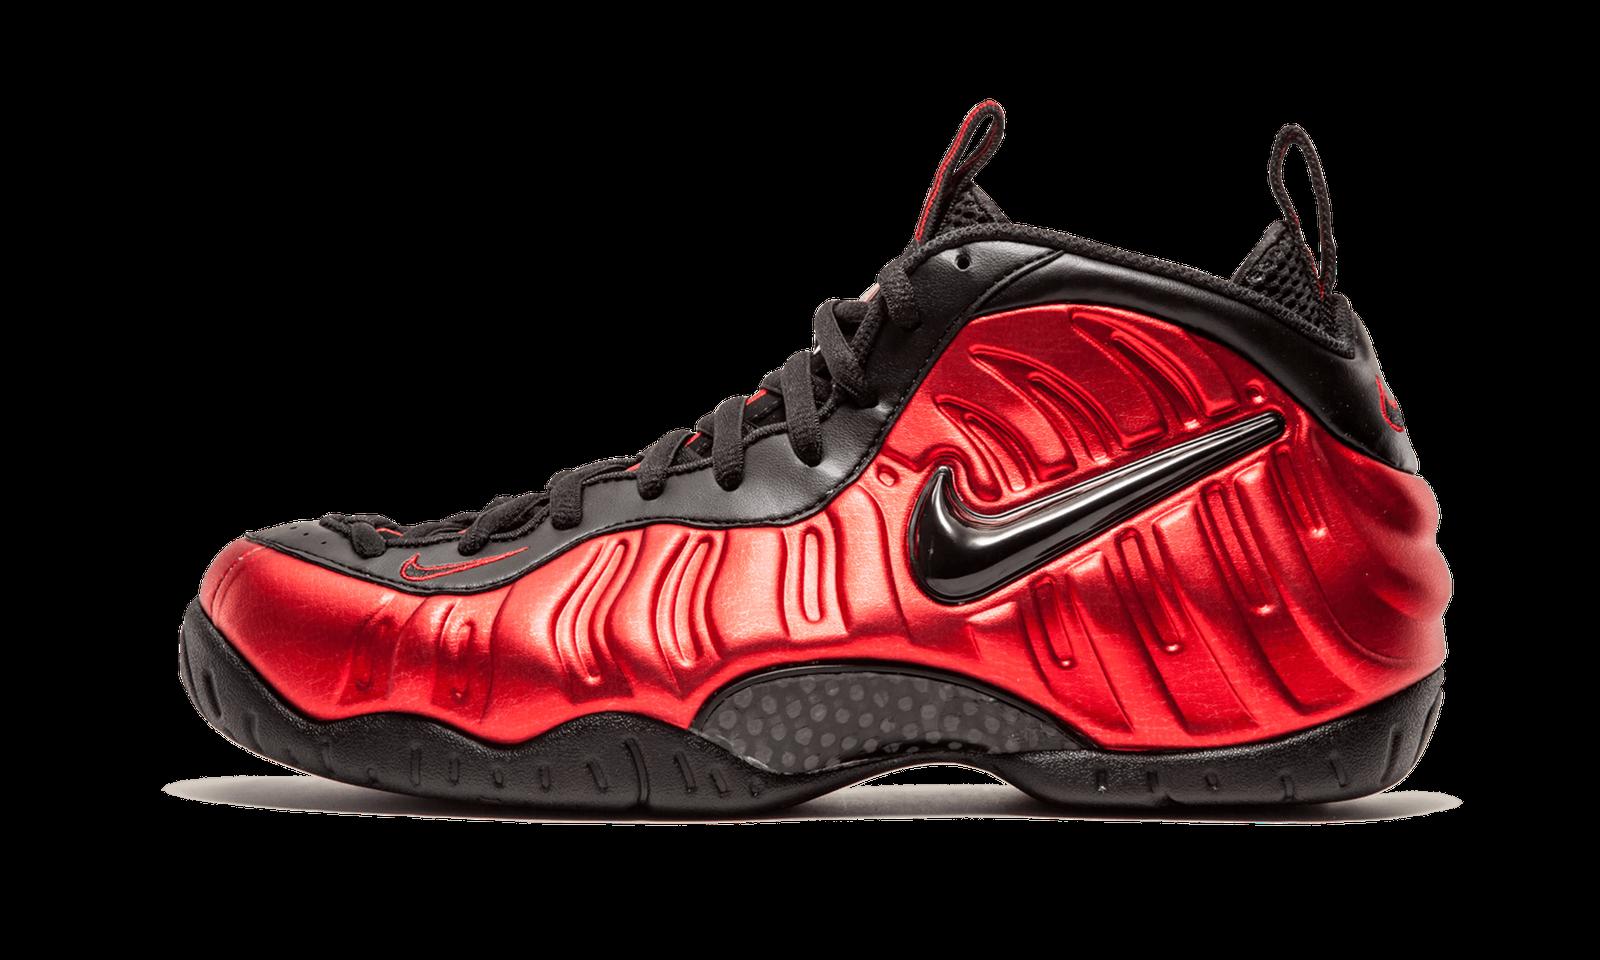 Nike Air Foamposite Pro METALLIC UNIVERSITY 624041-604 rouge  Noir OG 624041-604 UNIVERSITY sz 17 c3a09b